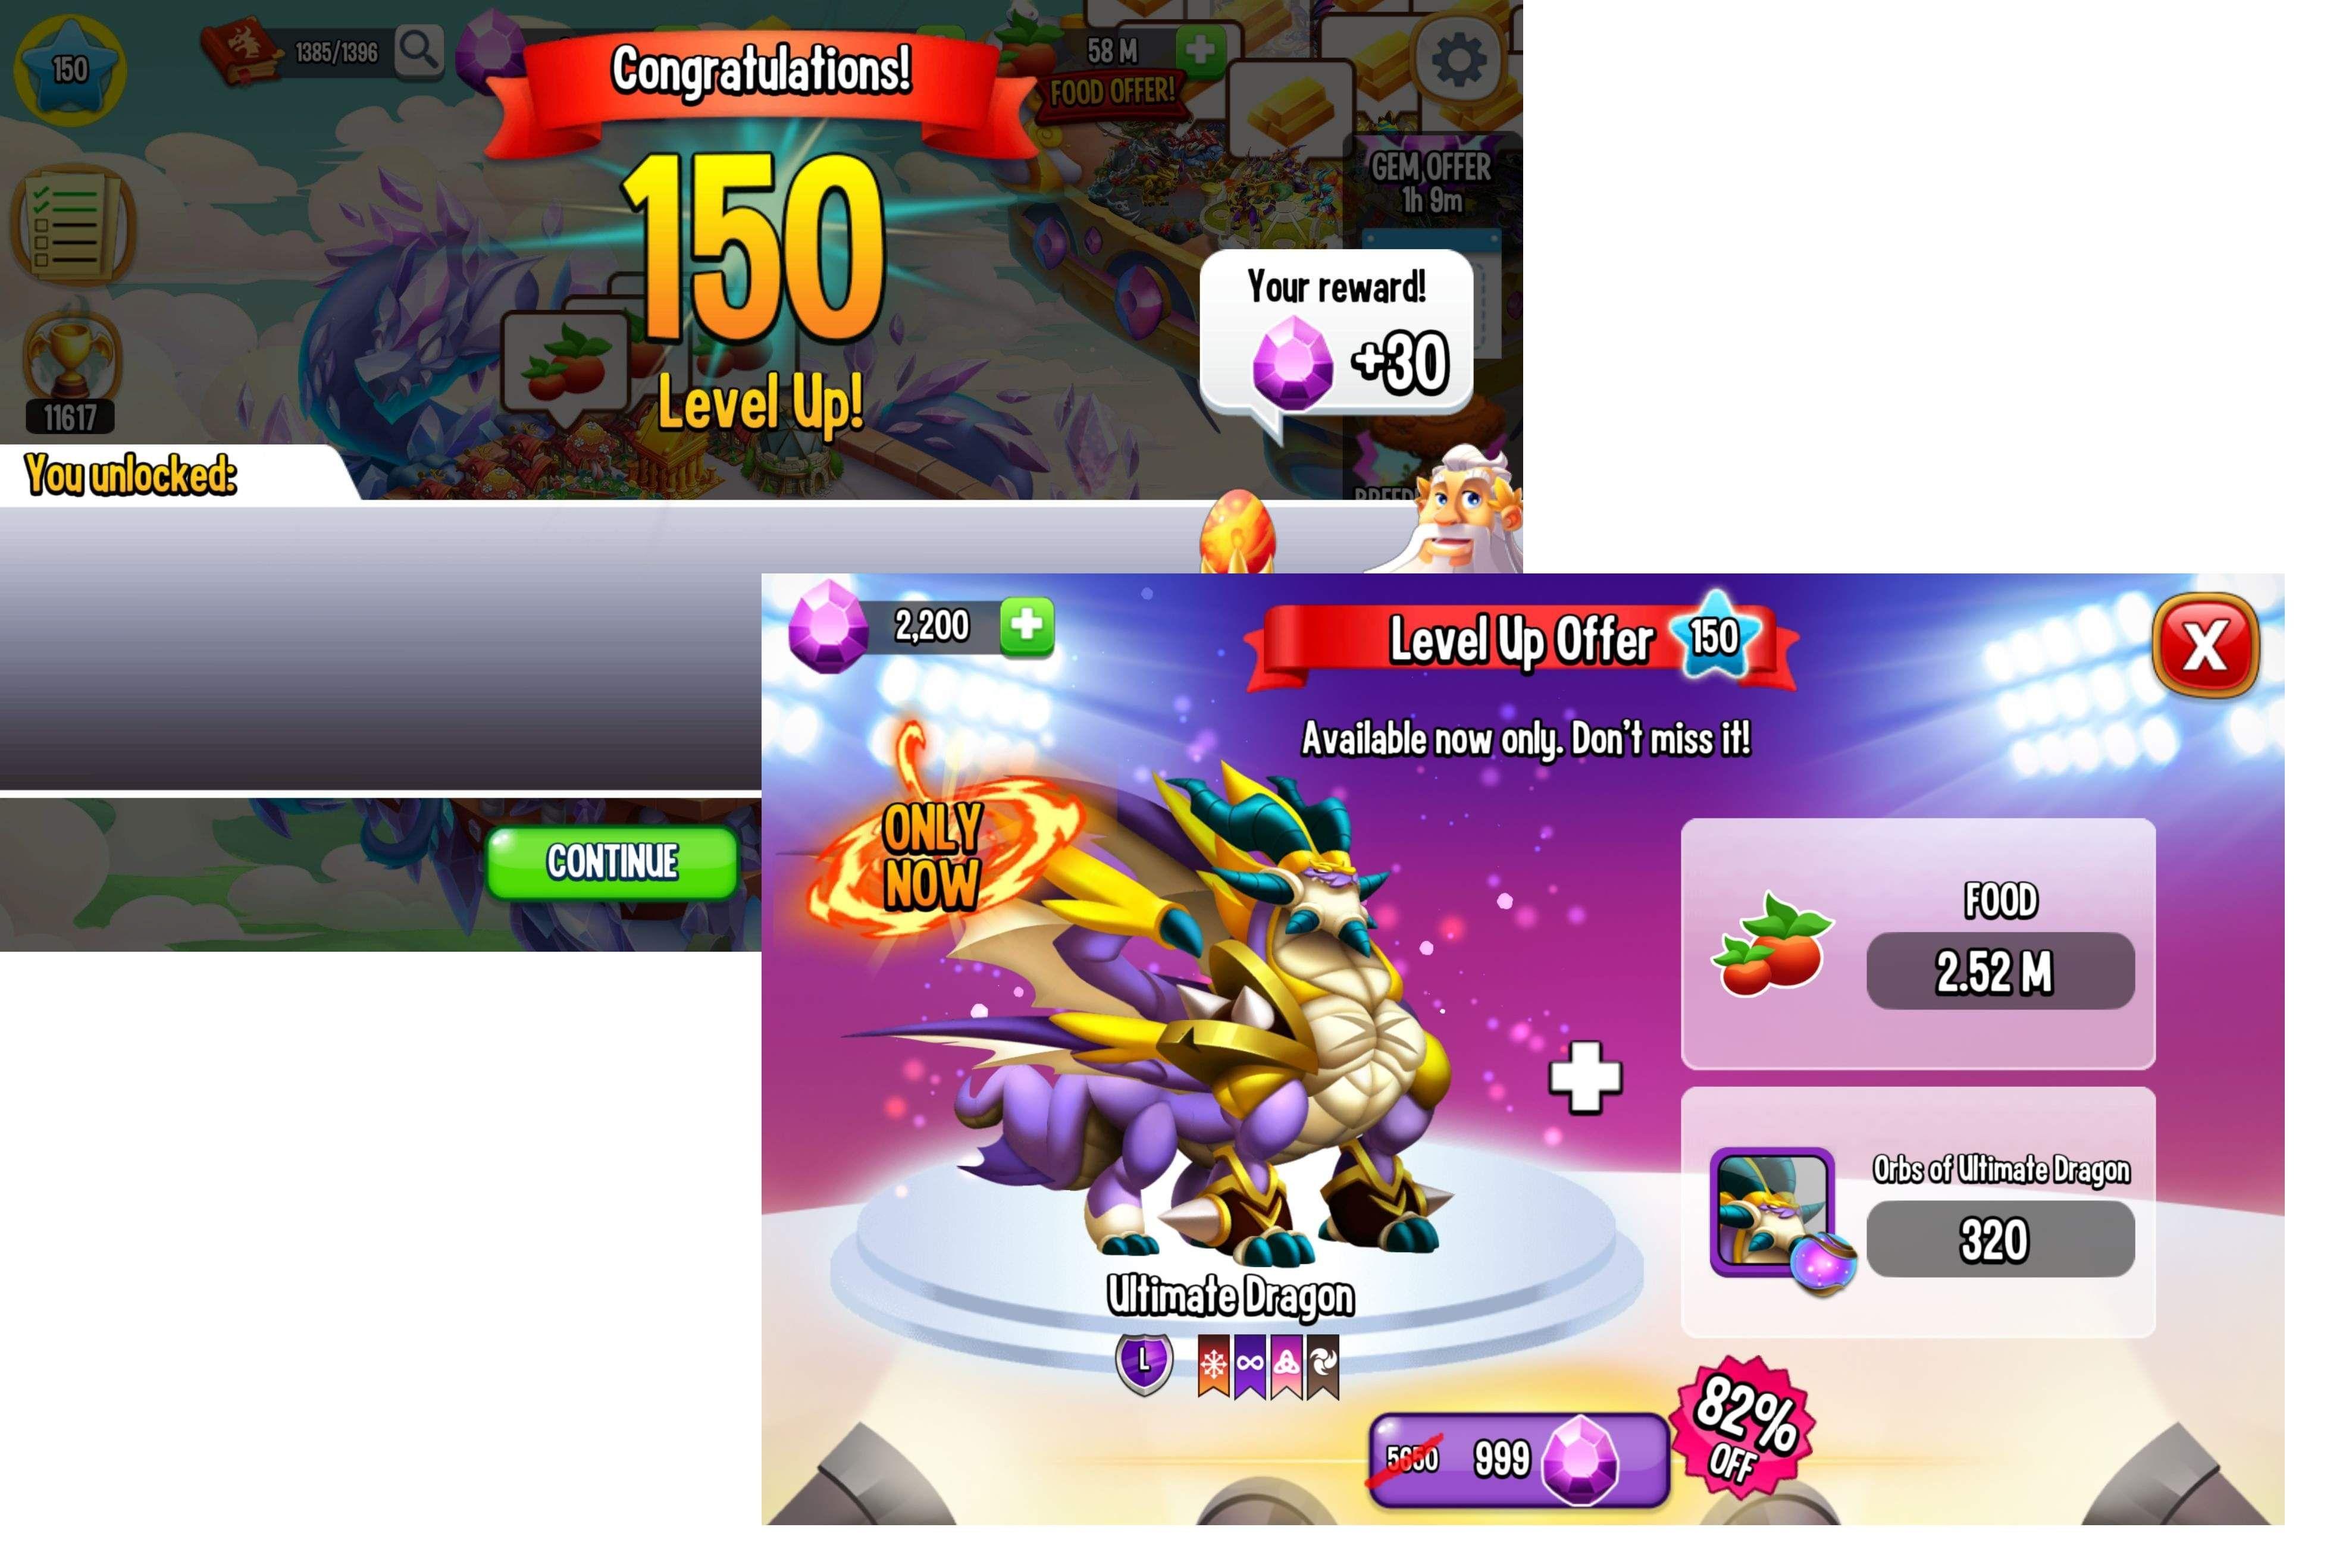 0_1601909747181_100520 level 150.jpg